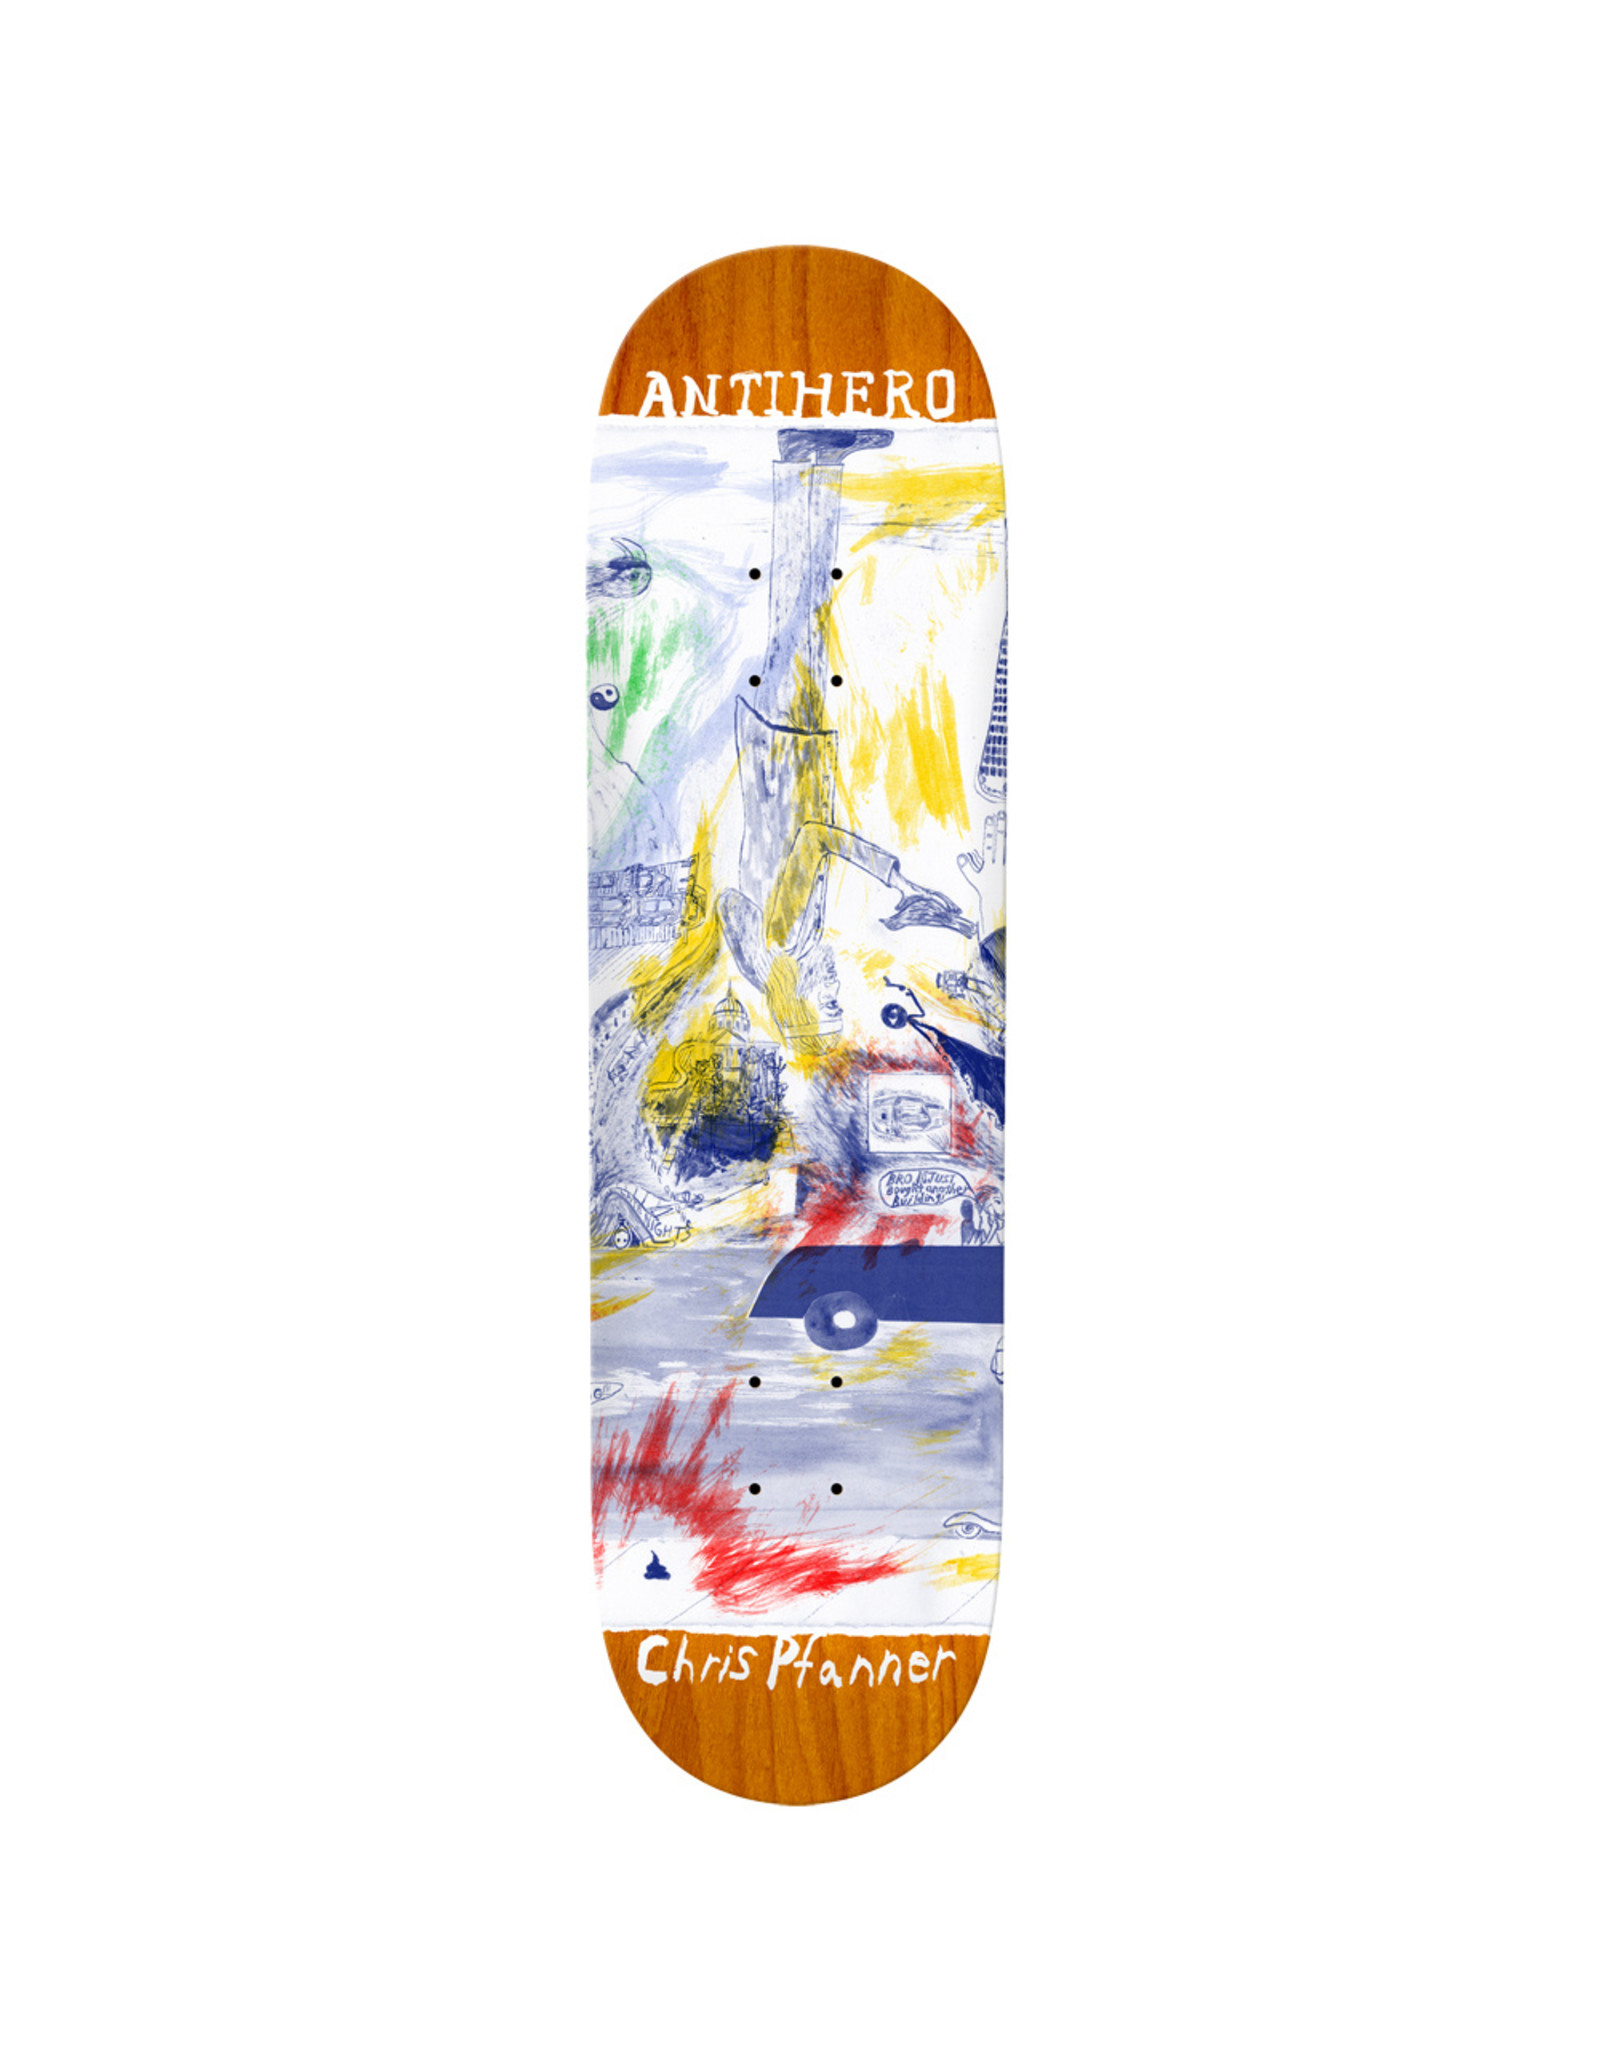 ANTIHERO ANTIHERO - THEN & NOW - 8.06 - PFANNER